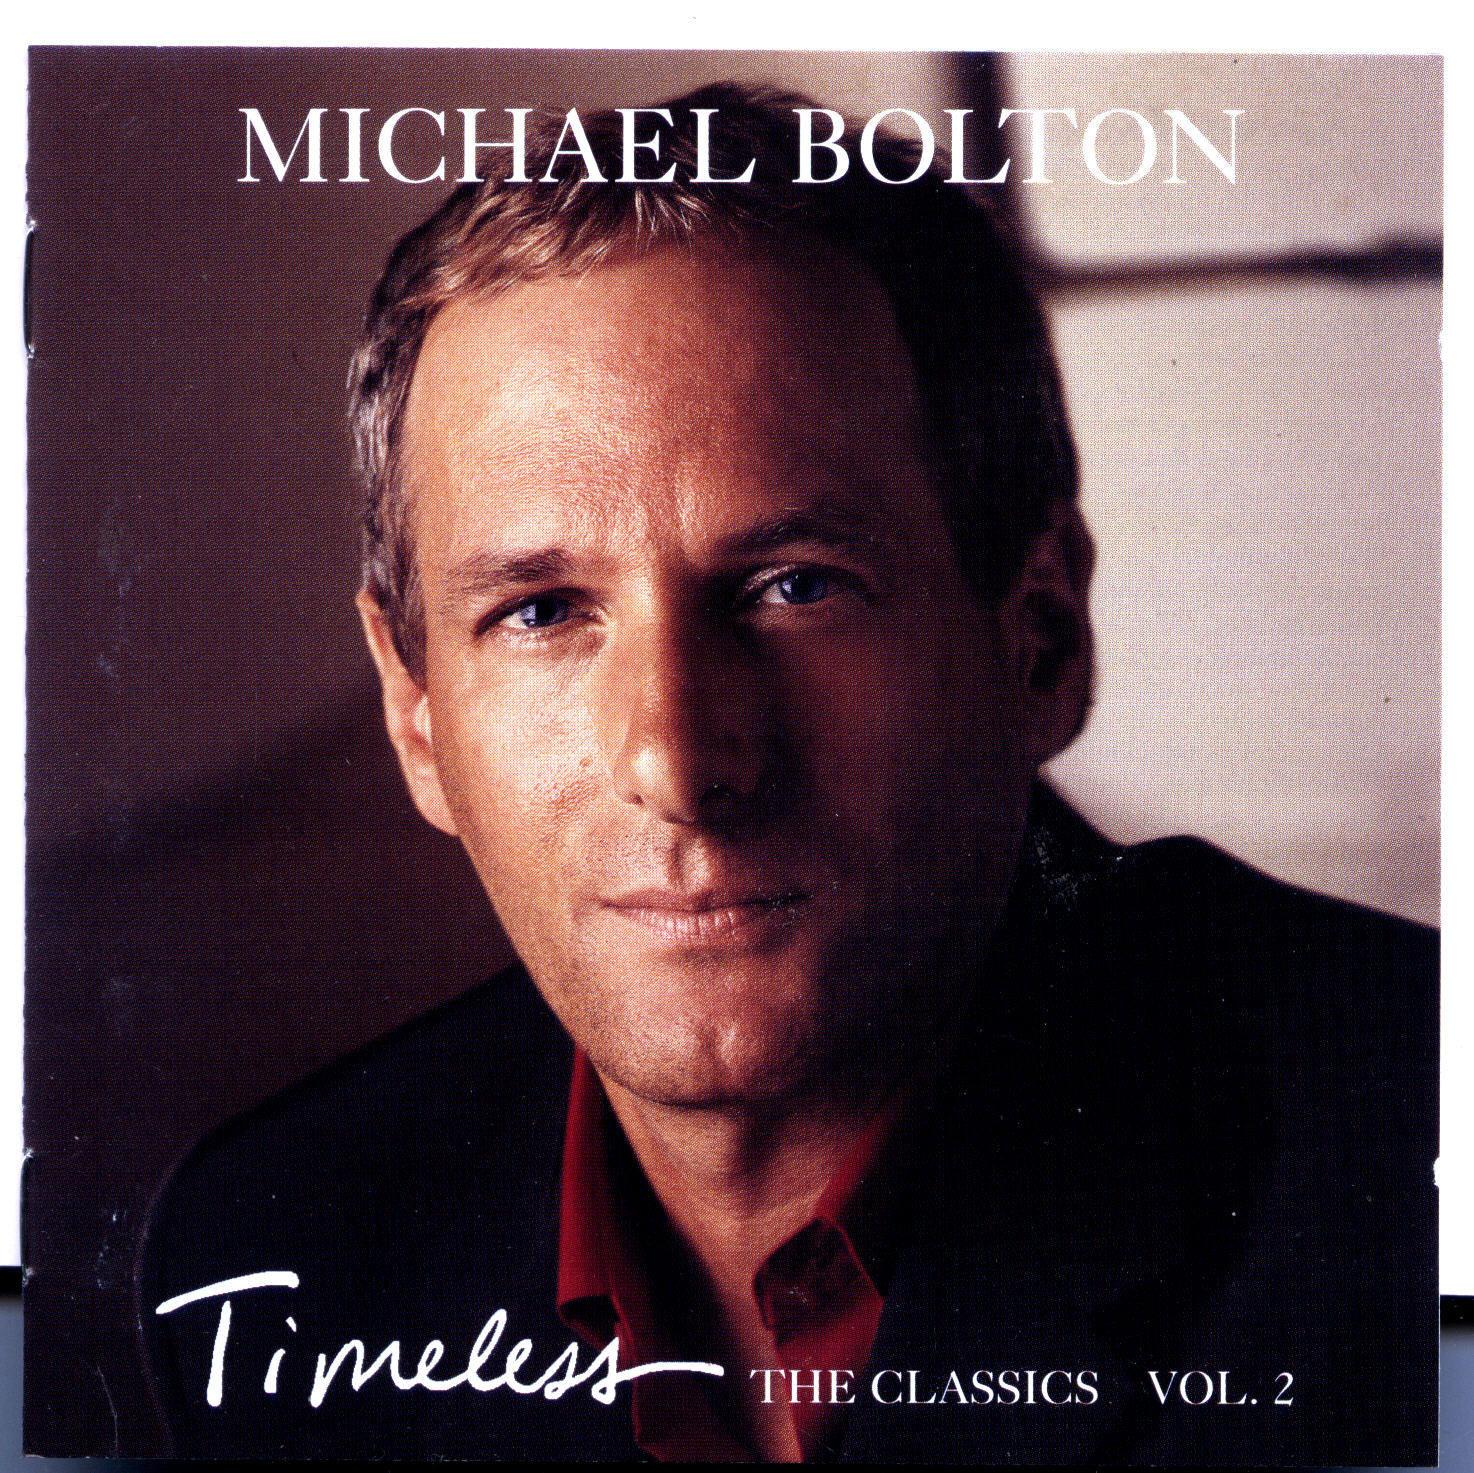 MIJAS: MICHAEL BOLTON - TIMELESS - THE CLASSICS VOL. 2